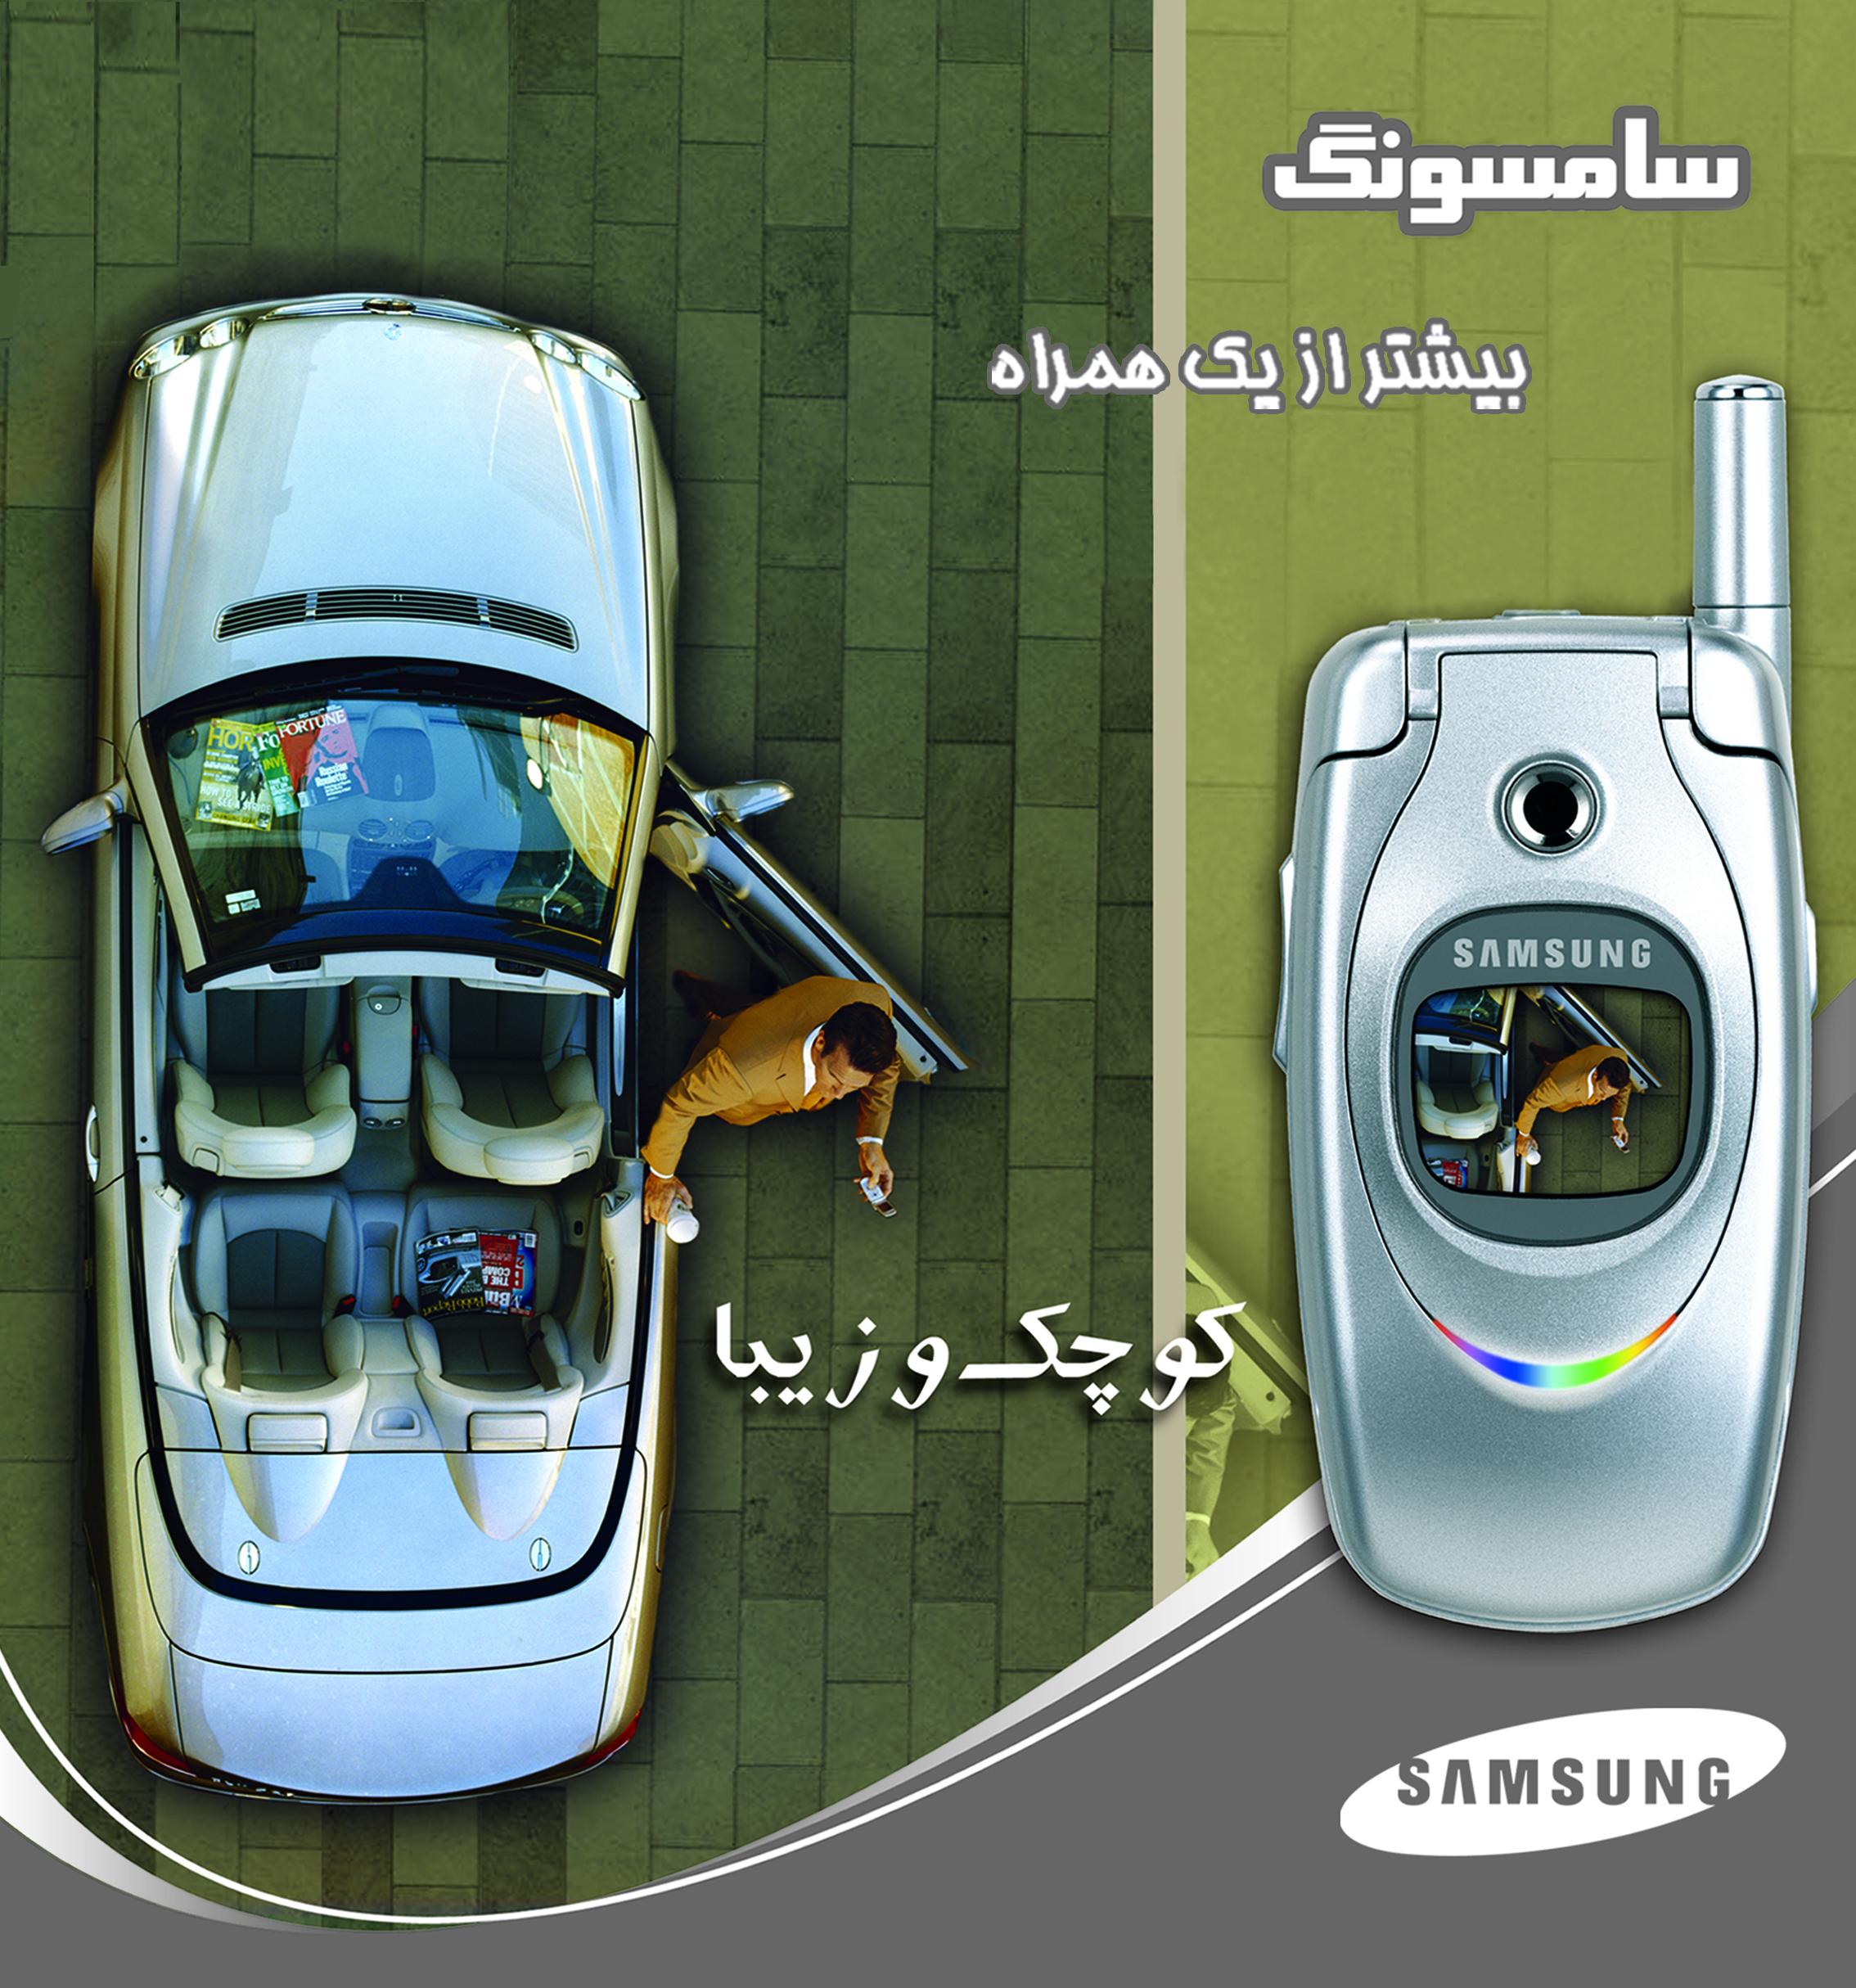 E600 Samsung Khorasan (83.11.07)